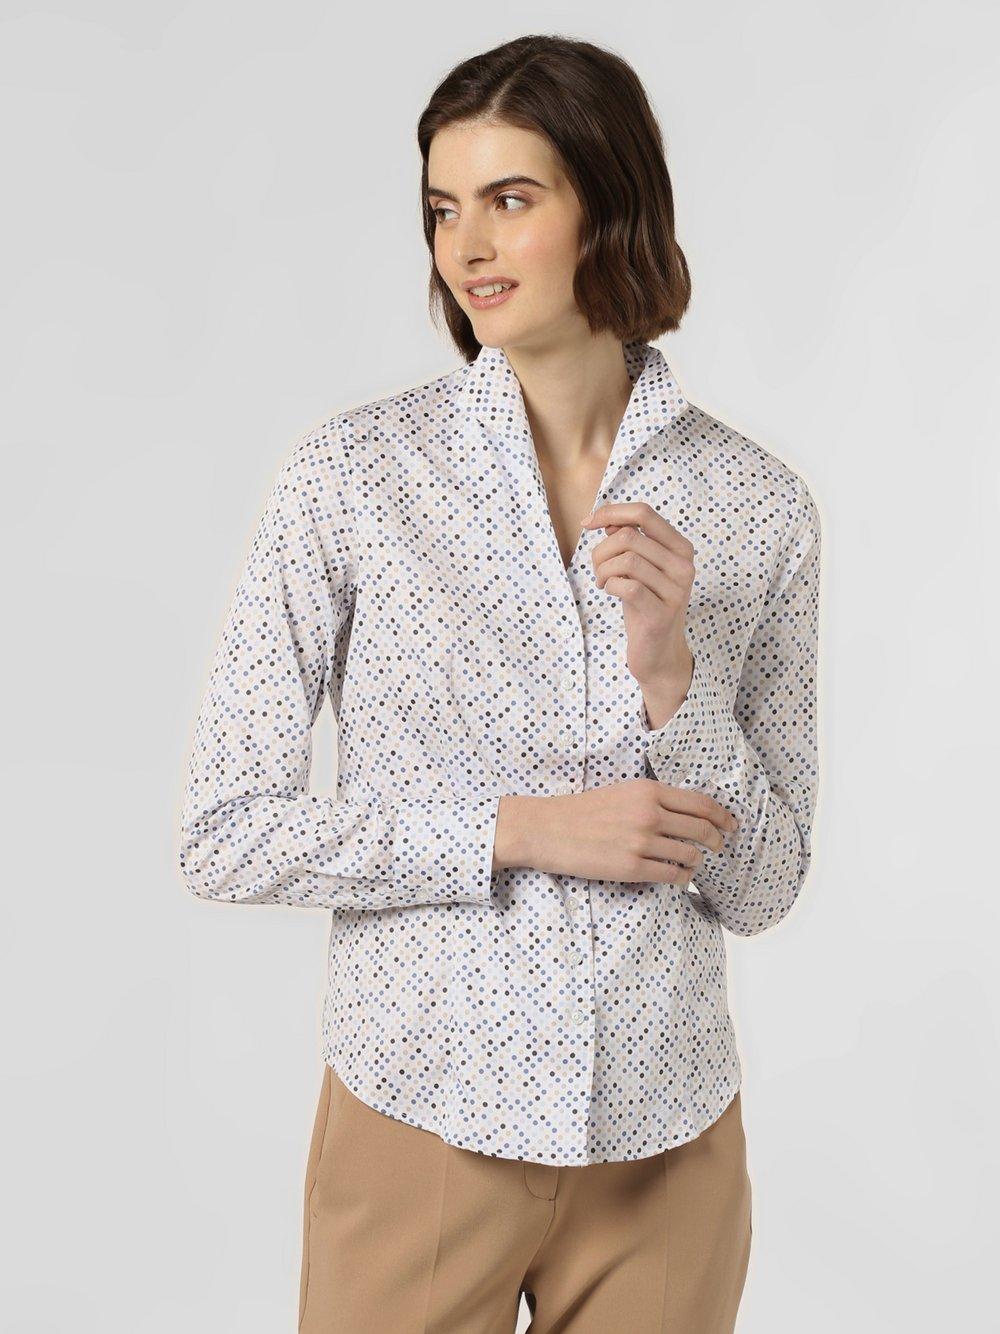 Franco Callegari – Bluzka damska łatwa w prasowaniu, niebieski Van Graaf 365389-0026